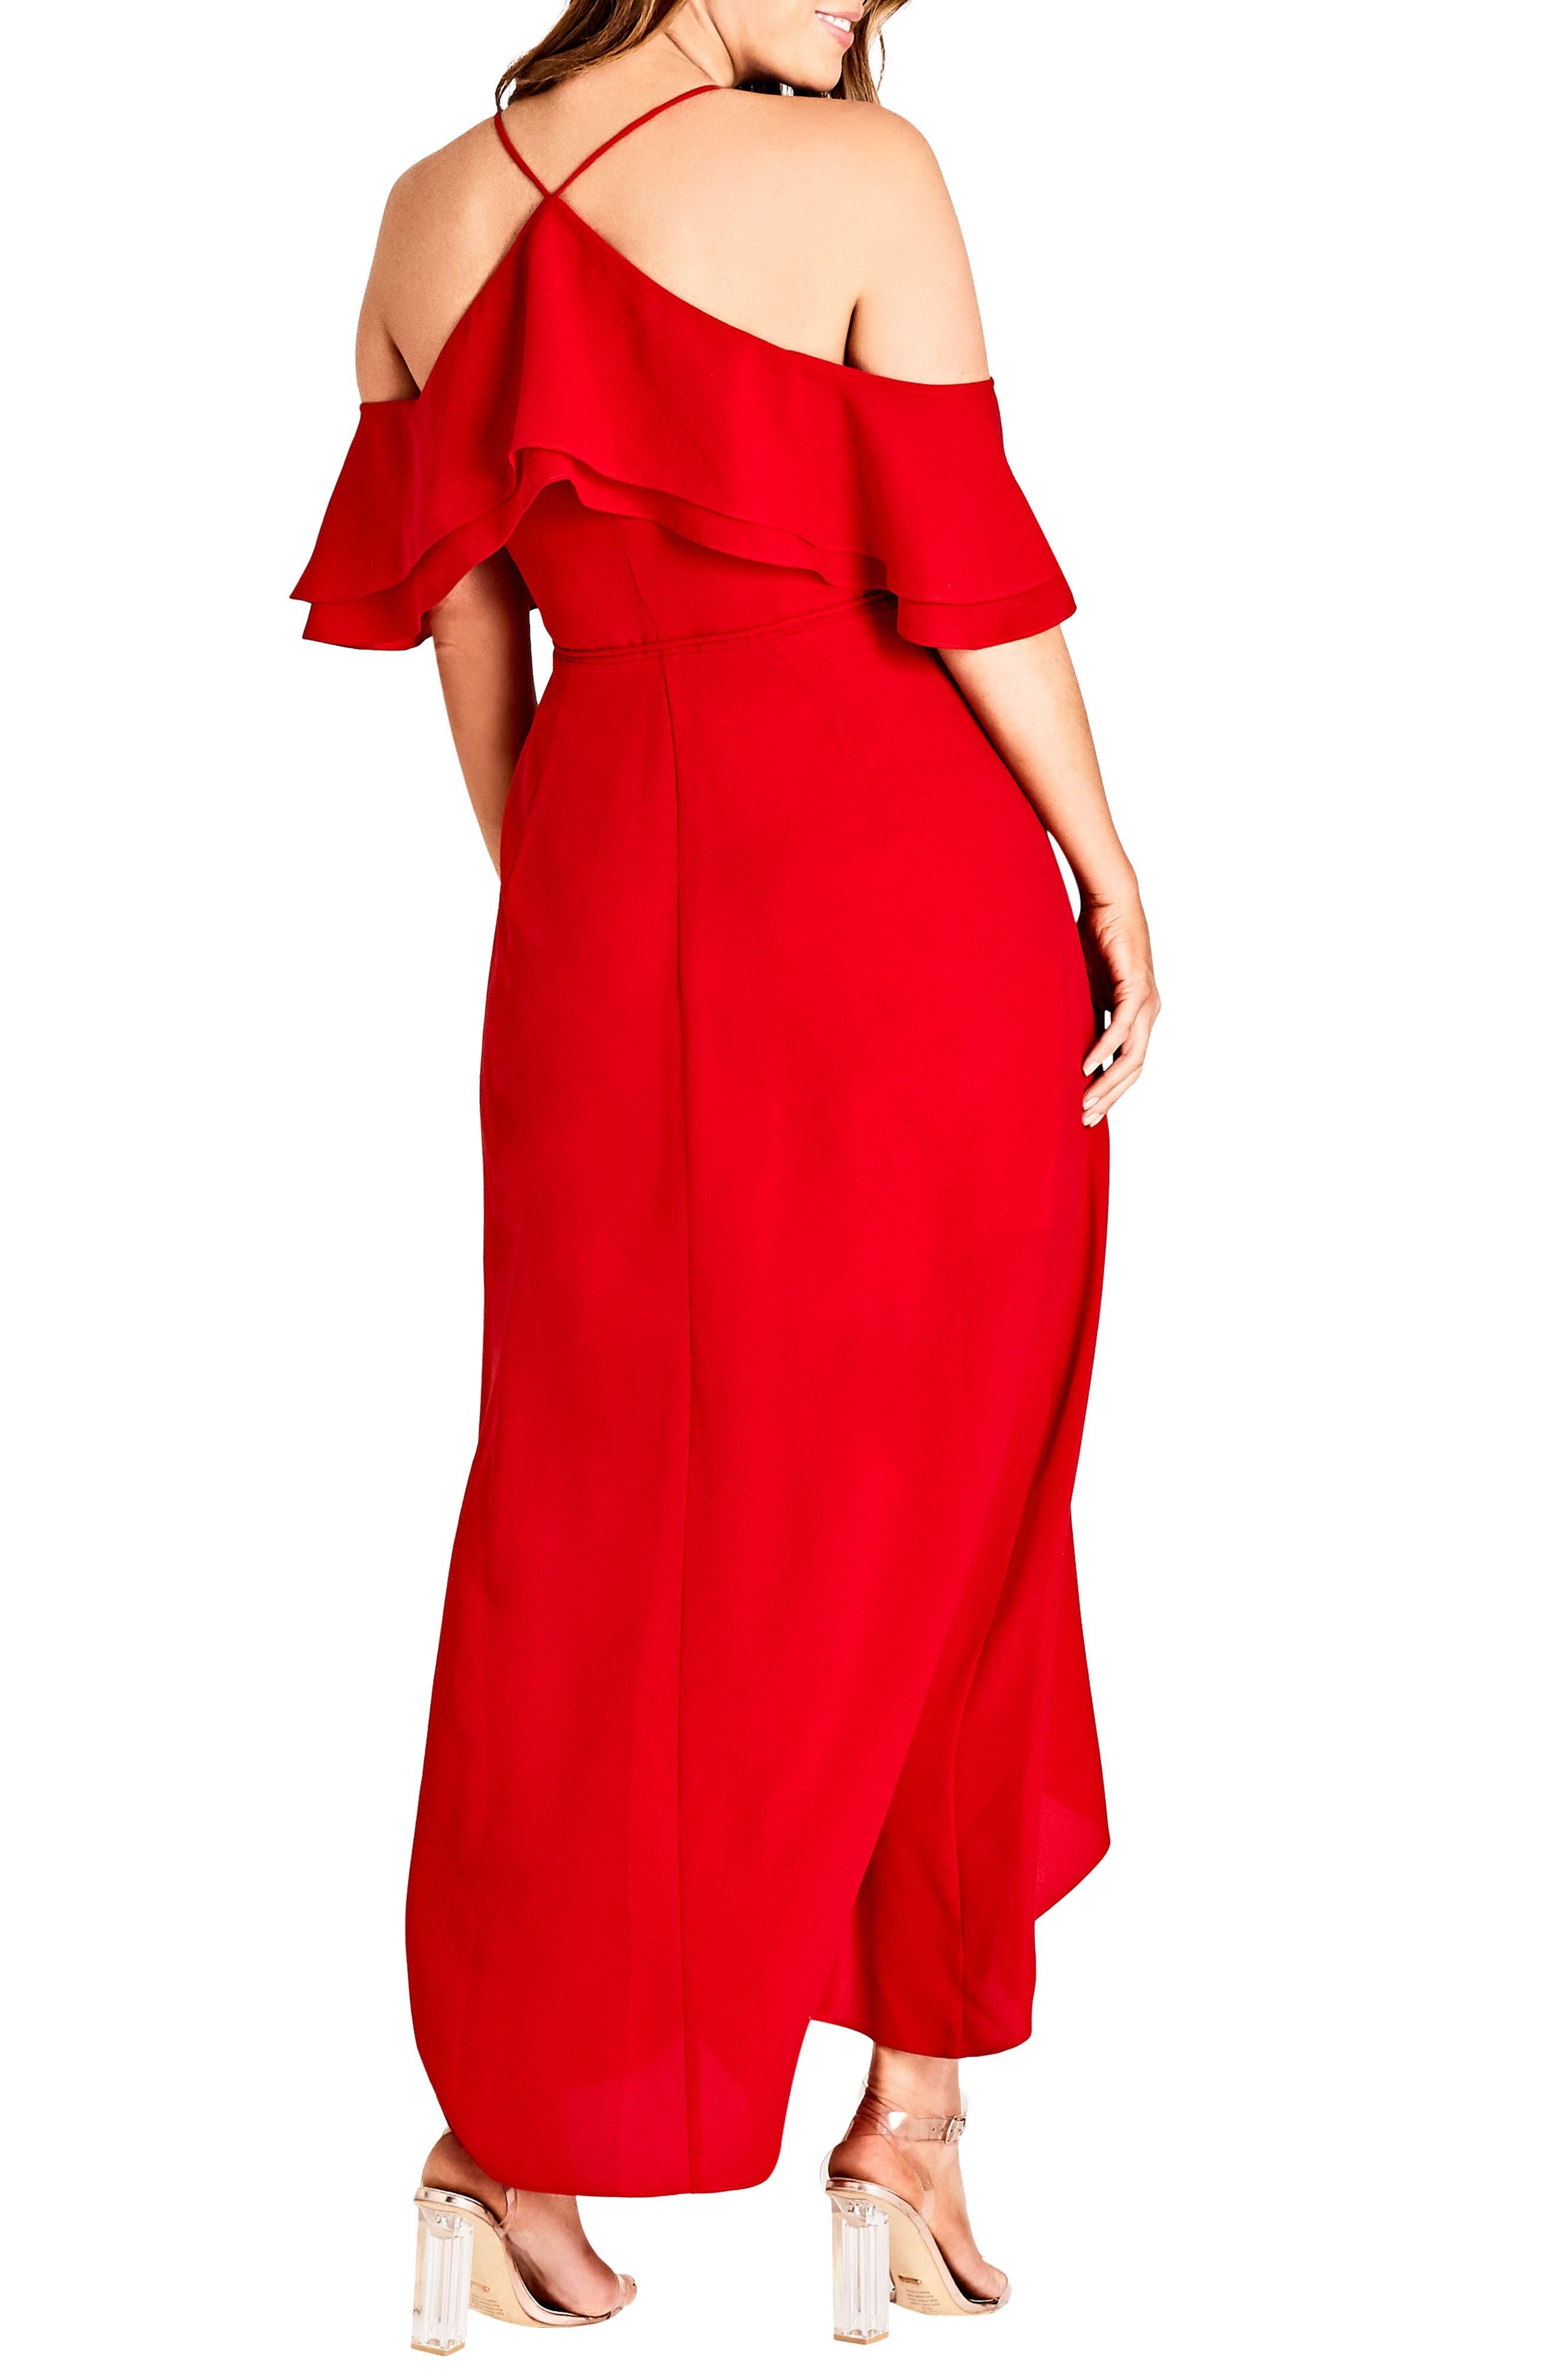 Miss Jessica Maxi Dress,                             Alternate thumbnail 2, color,                             Scarlet